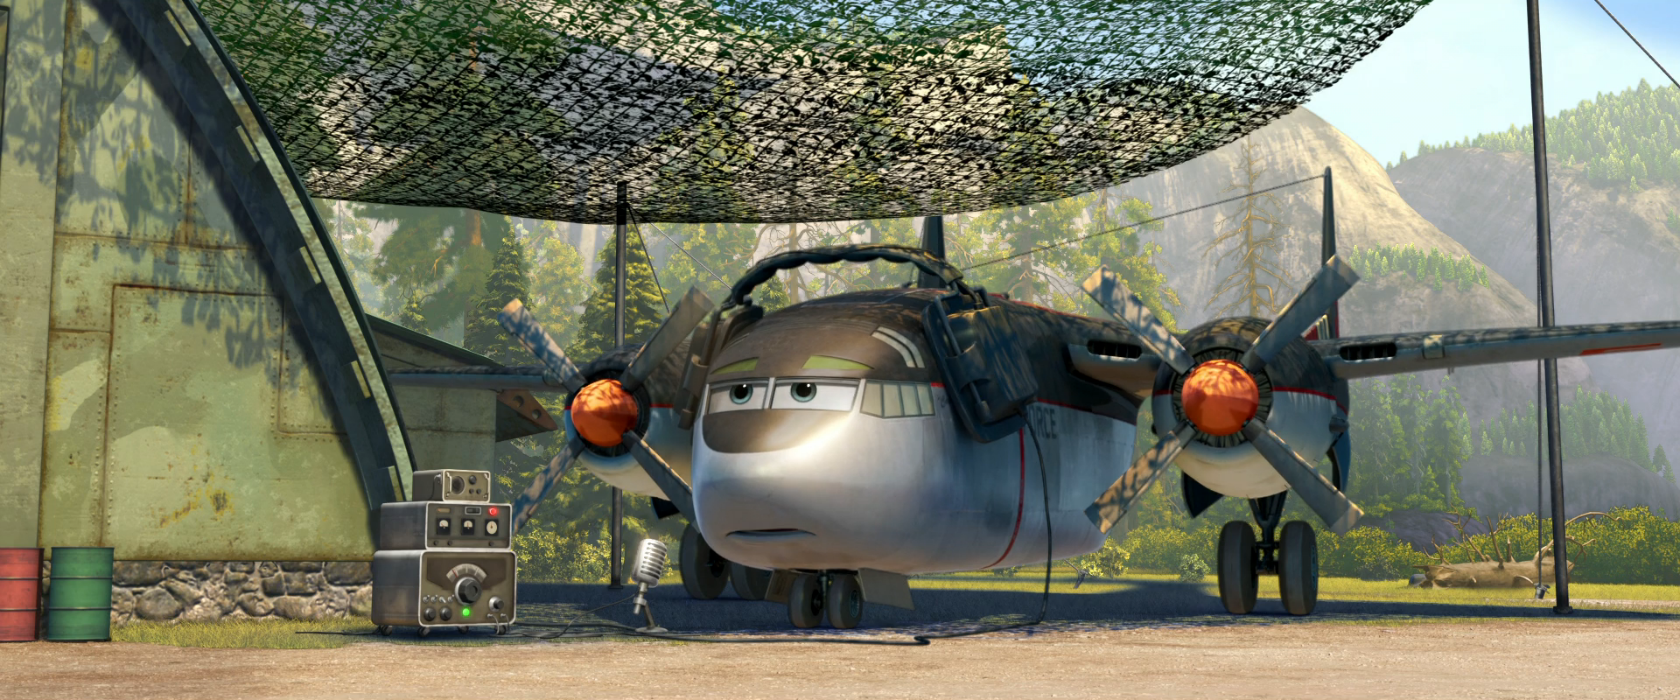 Image planes fire rescue 4g pixar wiki fandom powered by planes fire rescue 4g voltagebd Choice Image